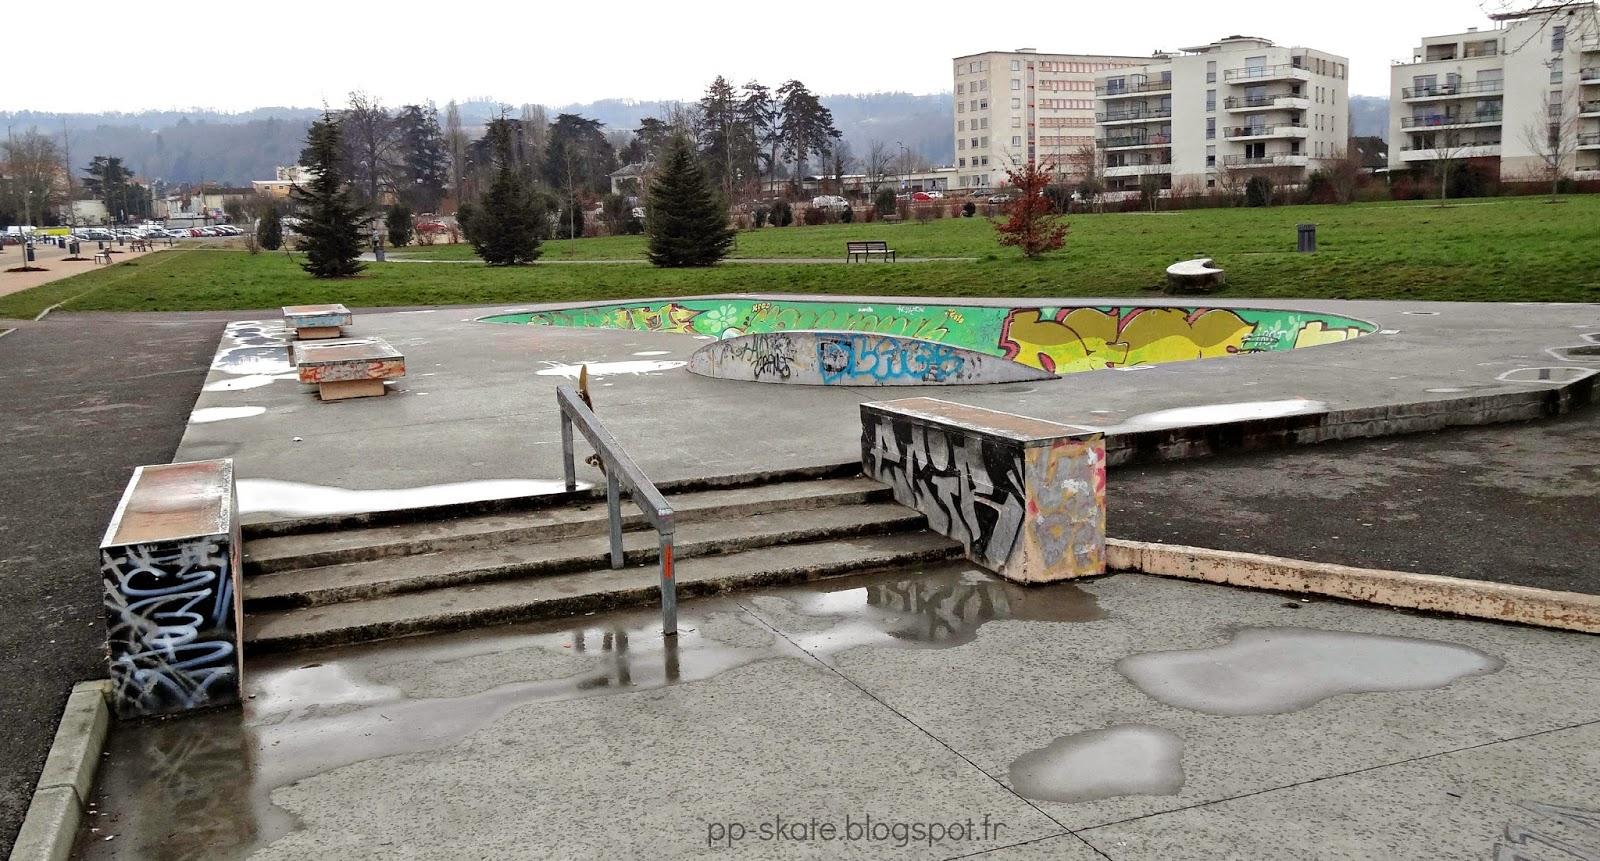 Skatepark Bourgoin Jallieu